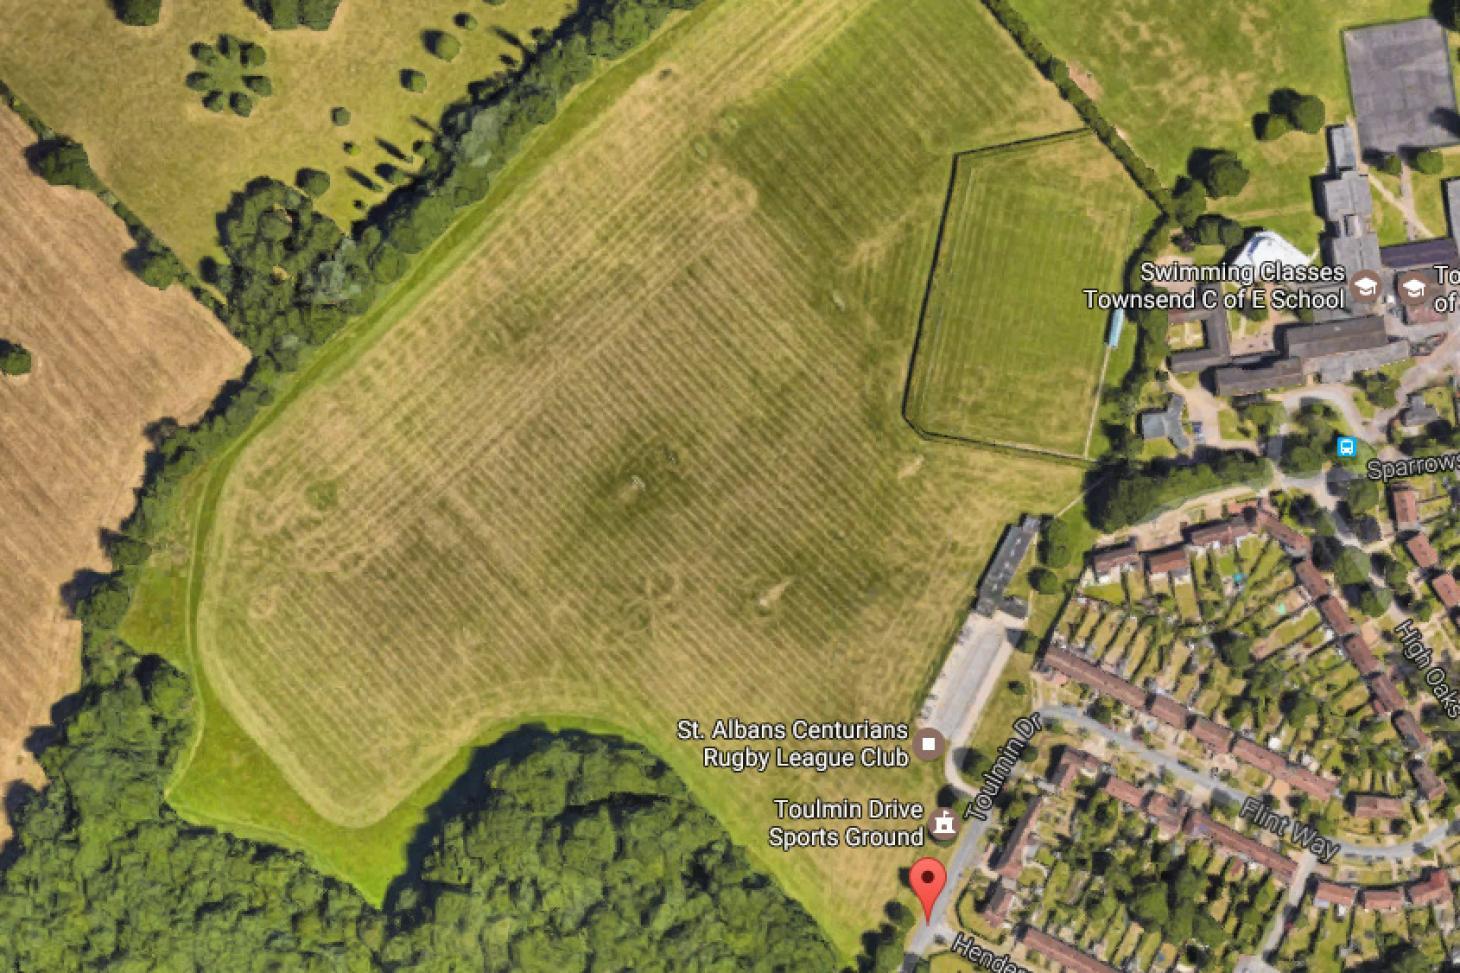 William Bird Open Space 11 a side | Grass football pitch